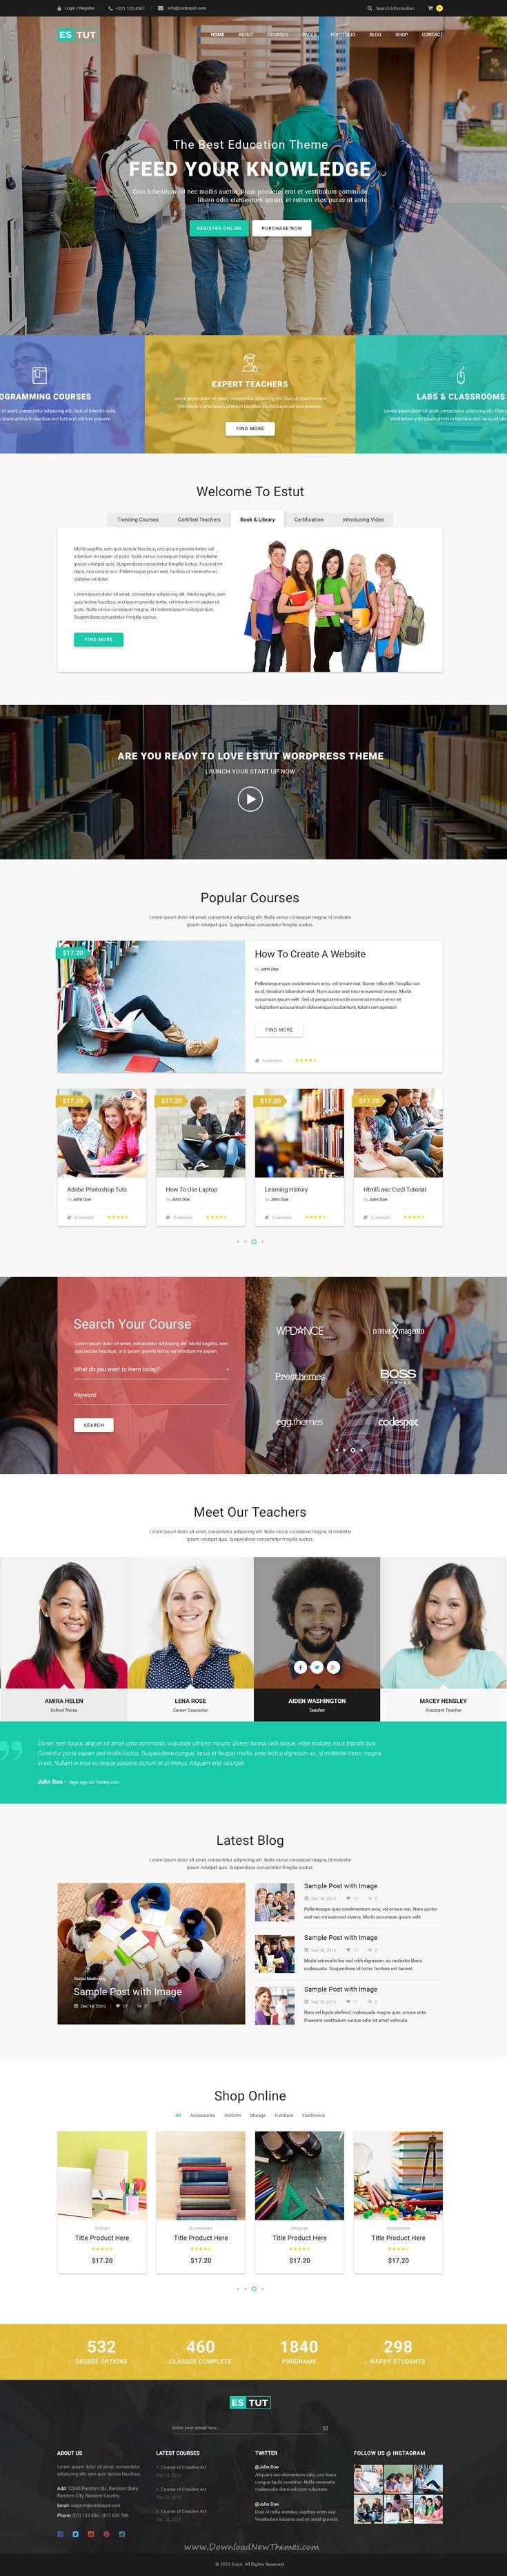 Best 25+ University website ideas that you will like on Pinterest